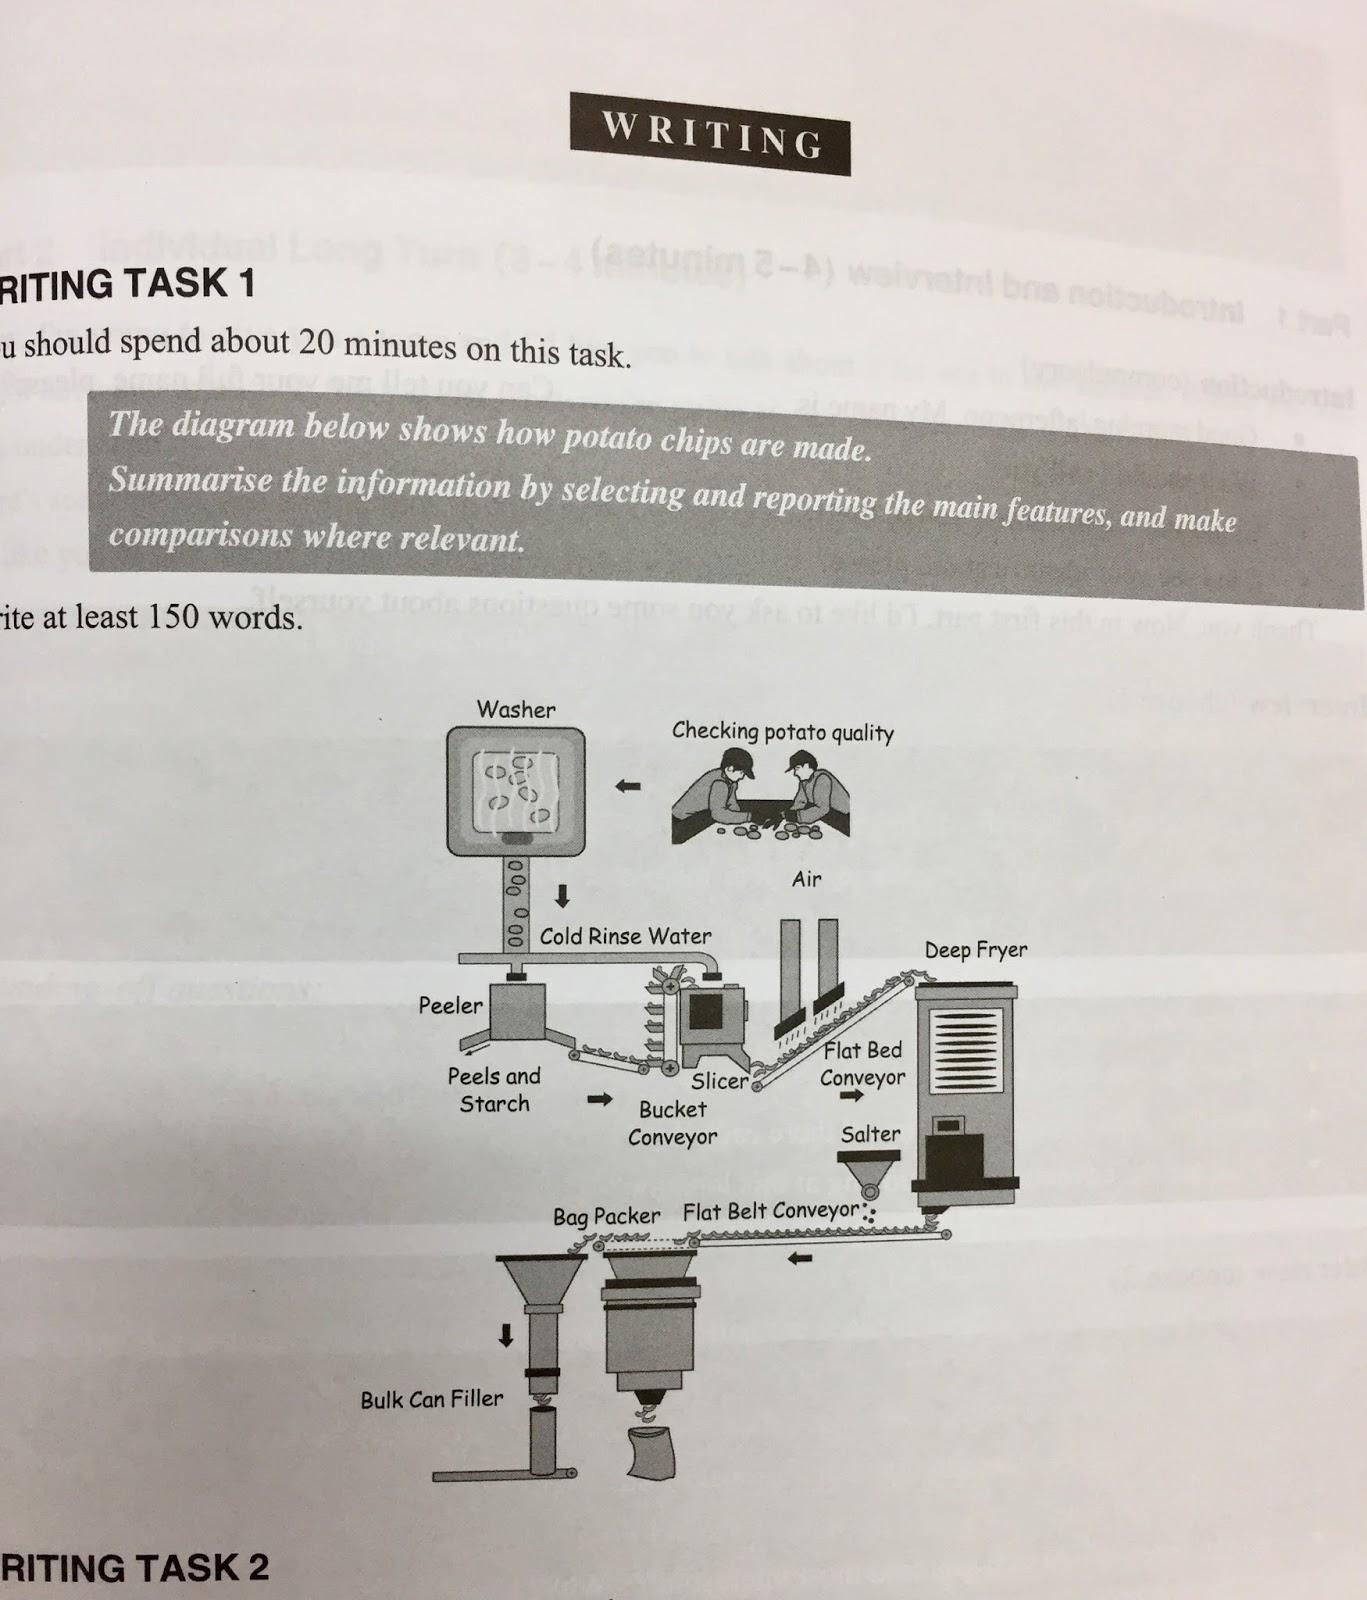 Free sample ielts writing blog task 1 diagram of how potato chips freeieltswritingsamples ccuart Images